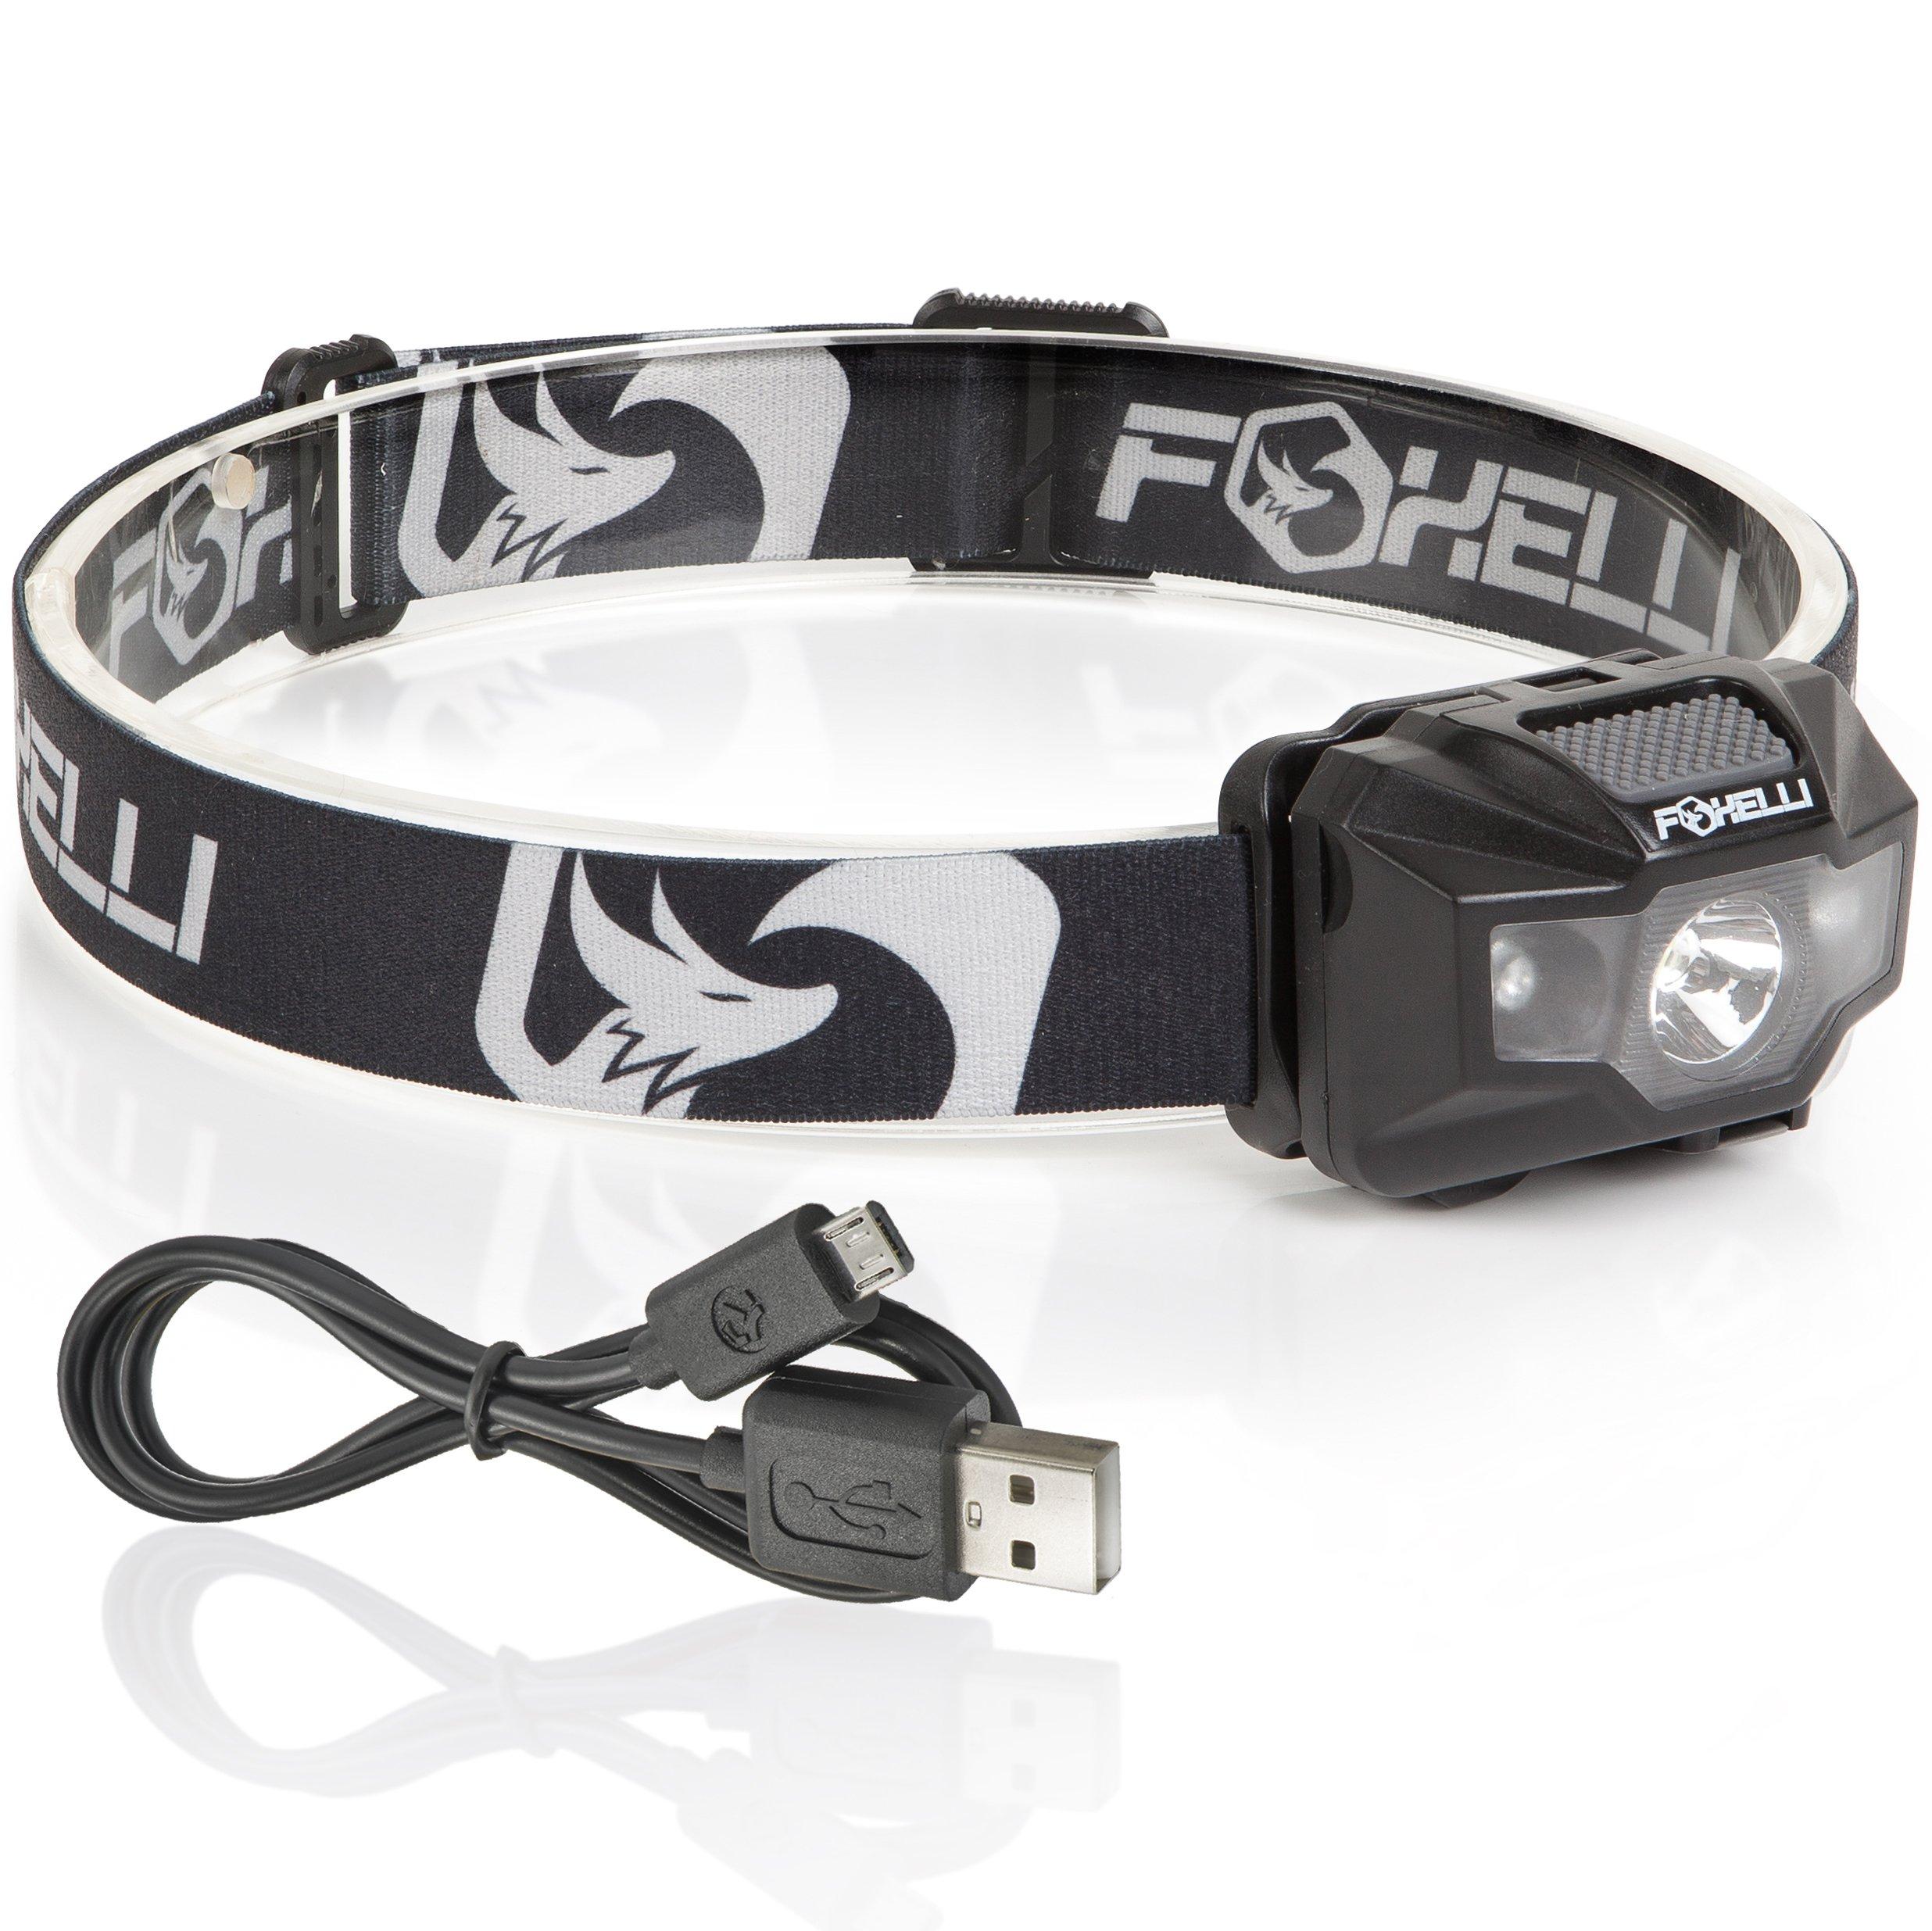 Foxelli USB Rechargeable Headlamp Flashlight